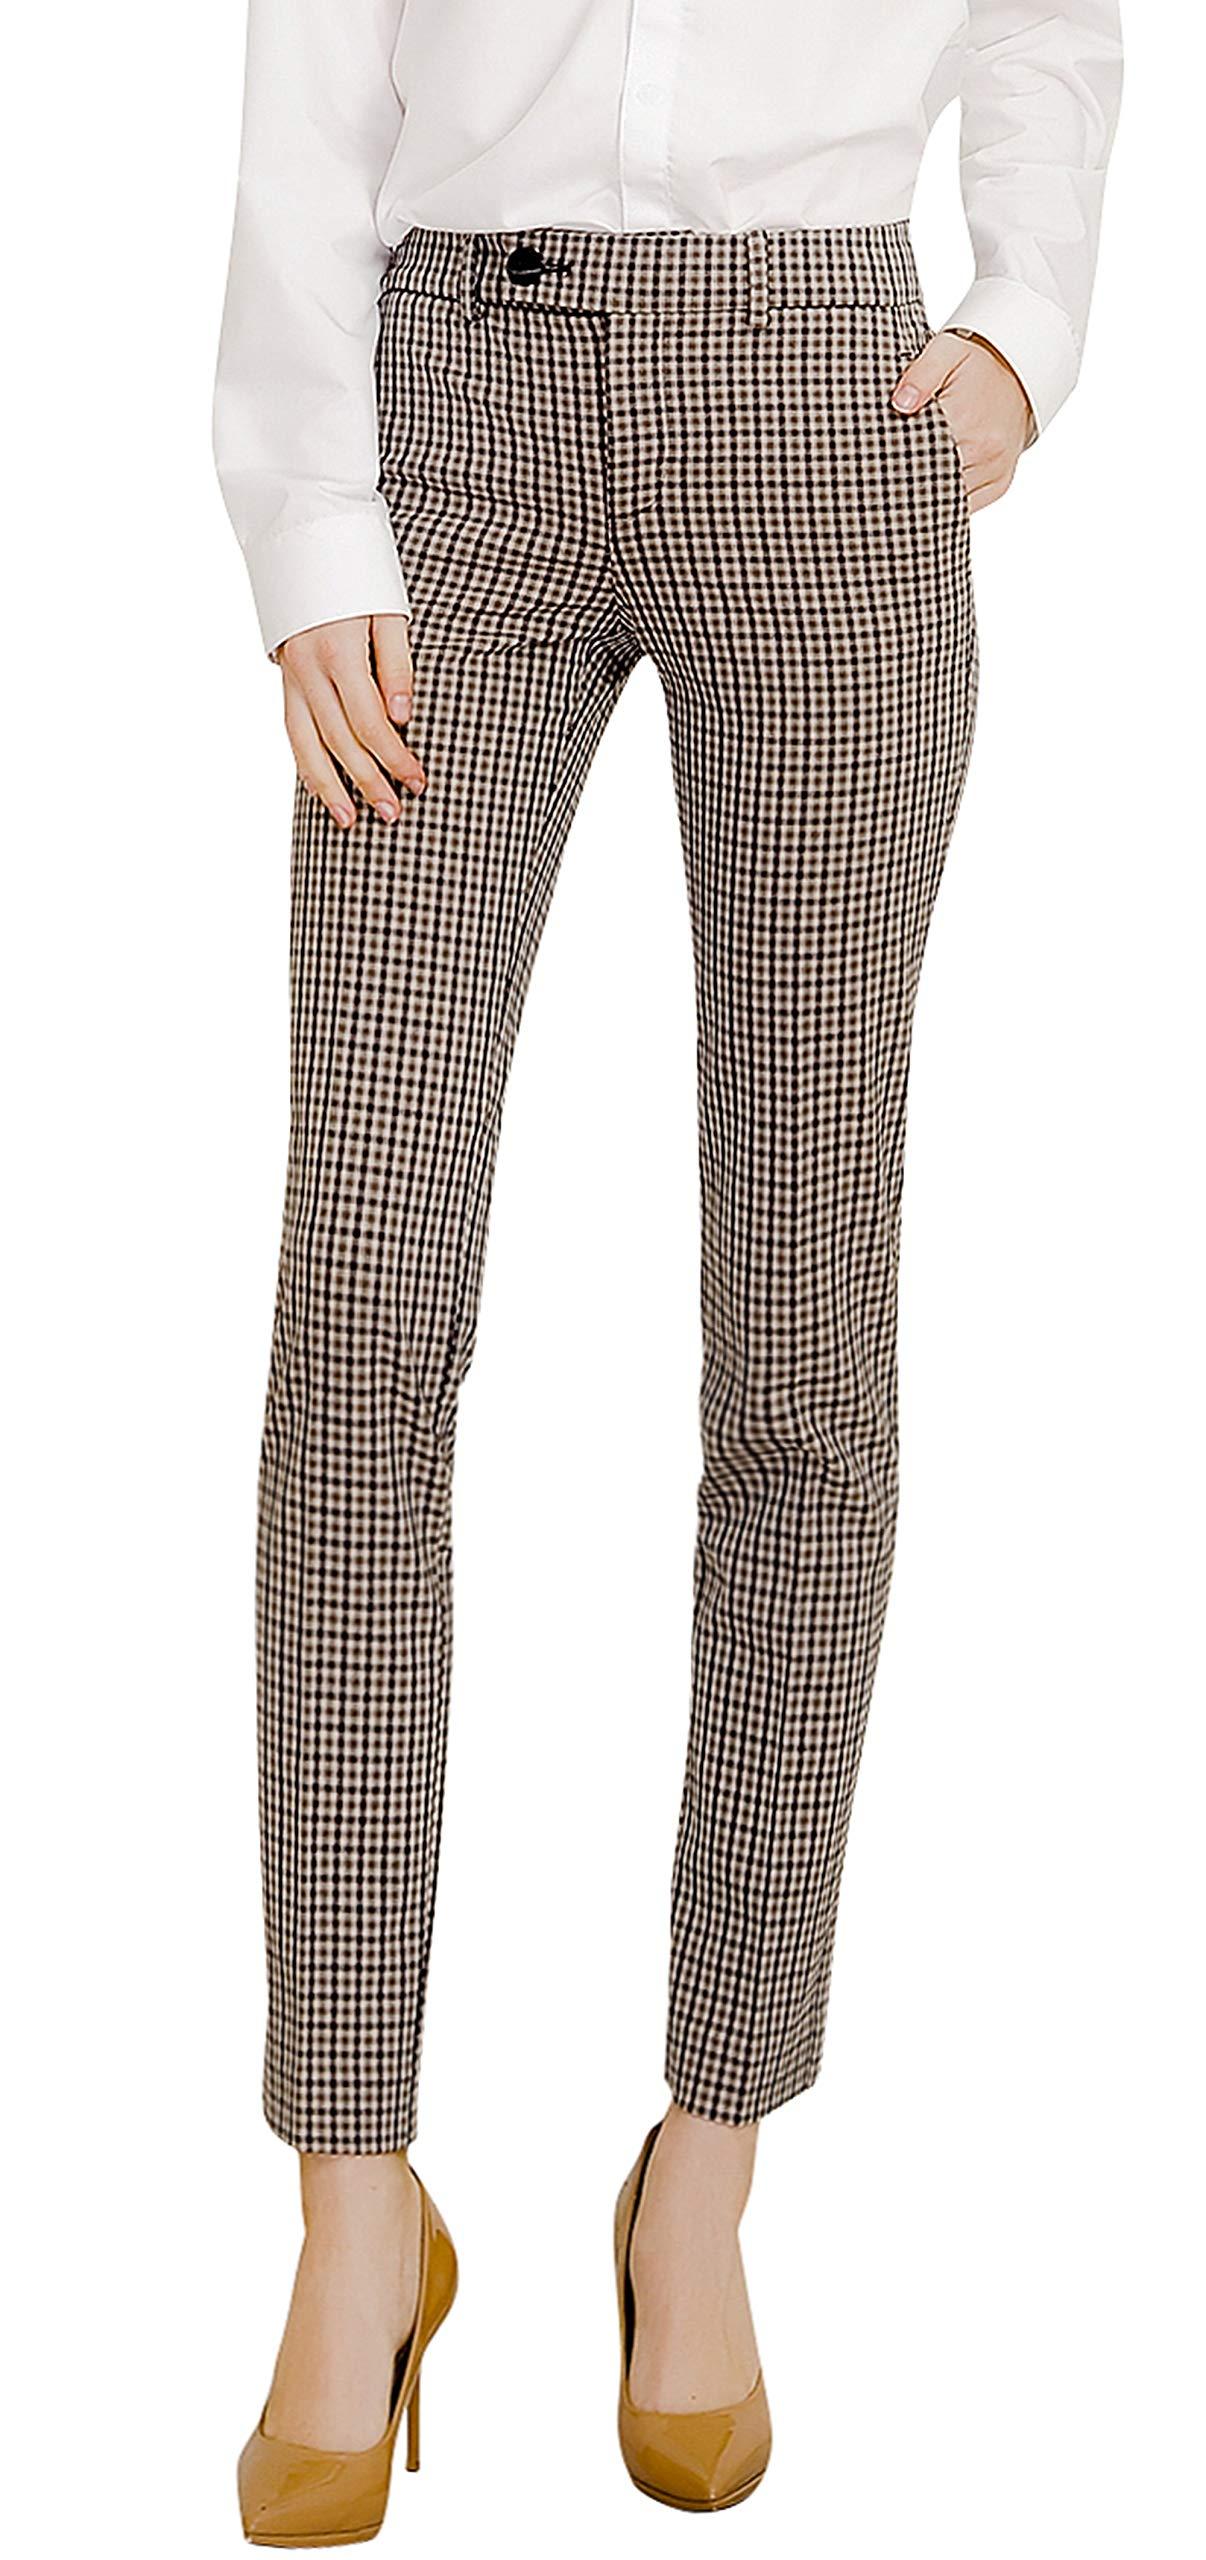 Marycrafts Women's Work Dress Pants Straight Leg Bootcut Trousers